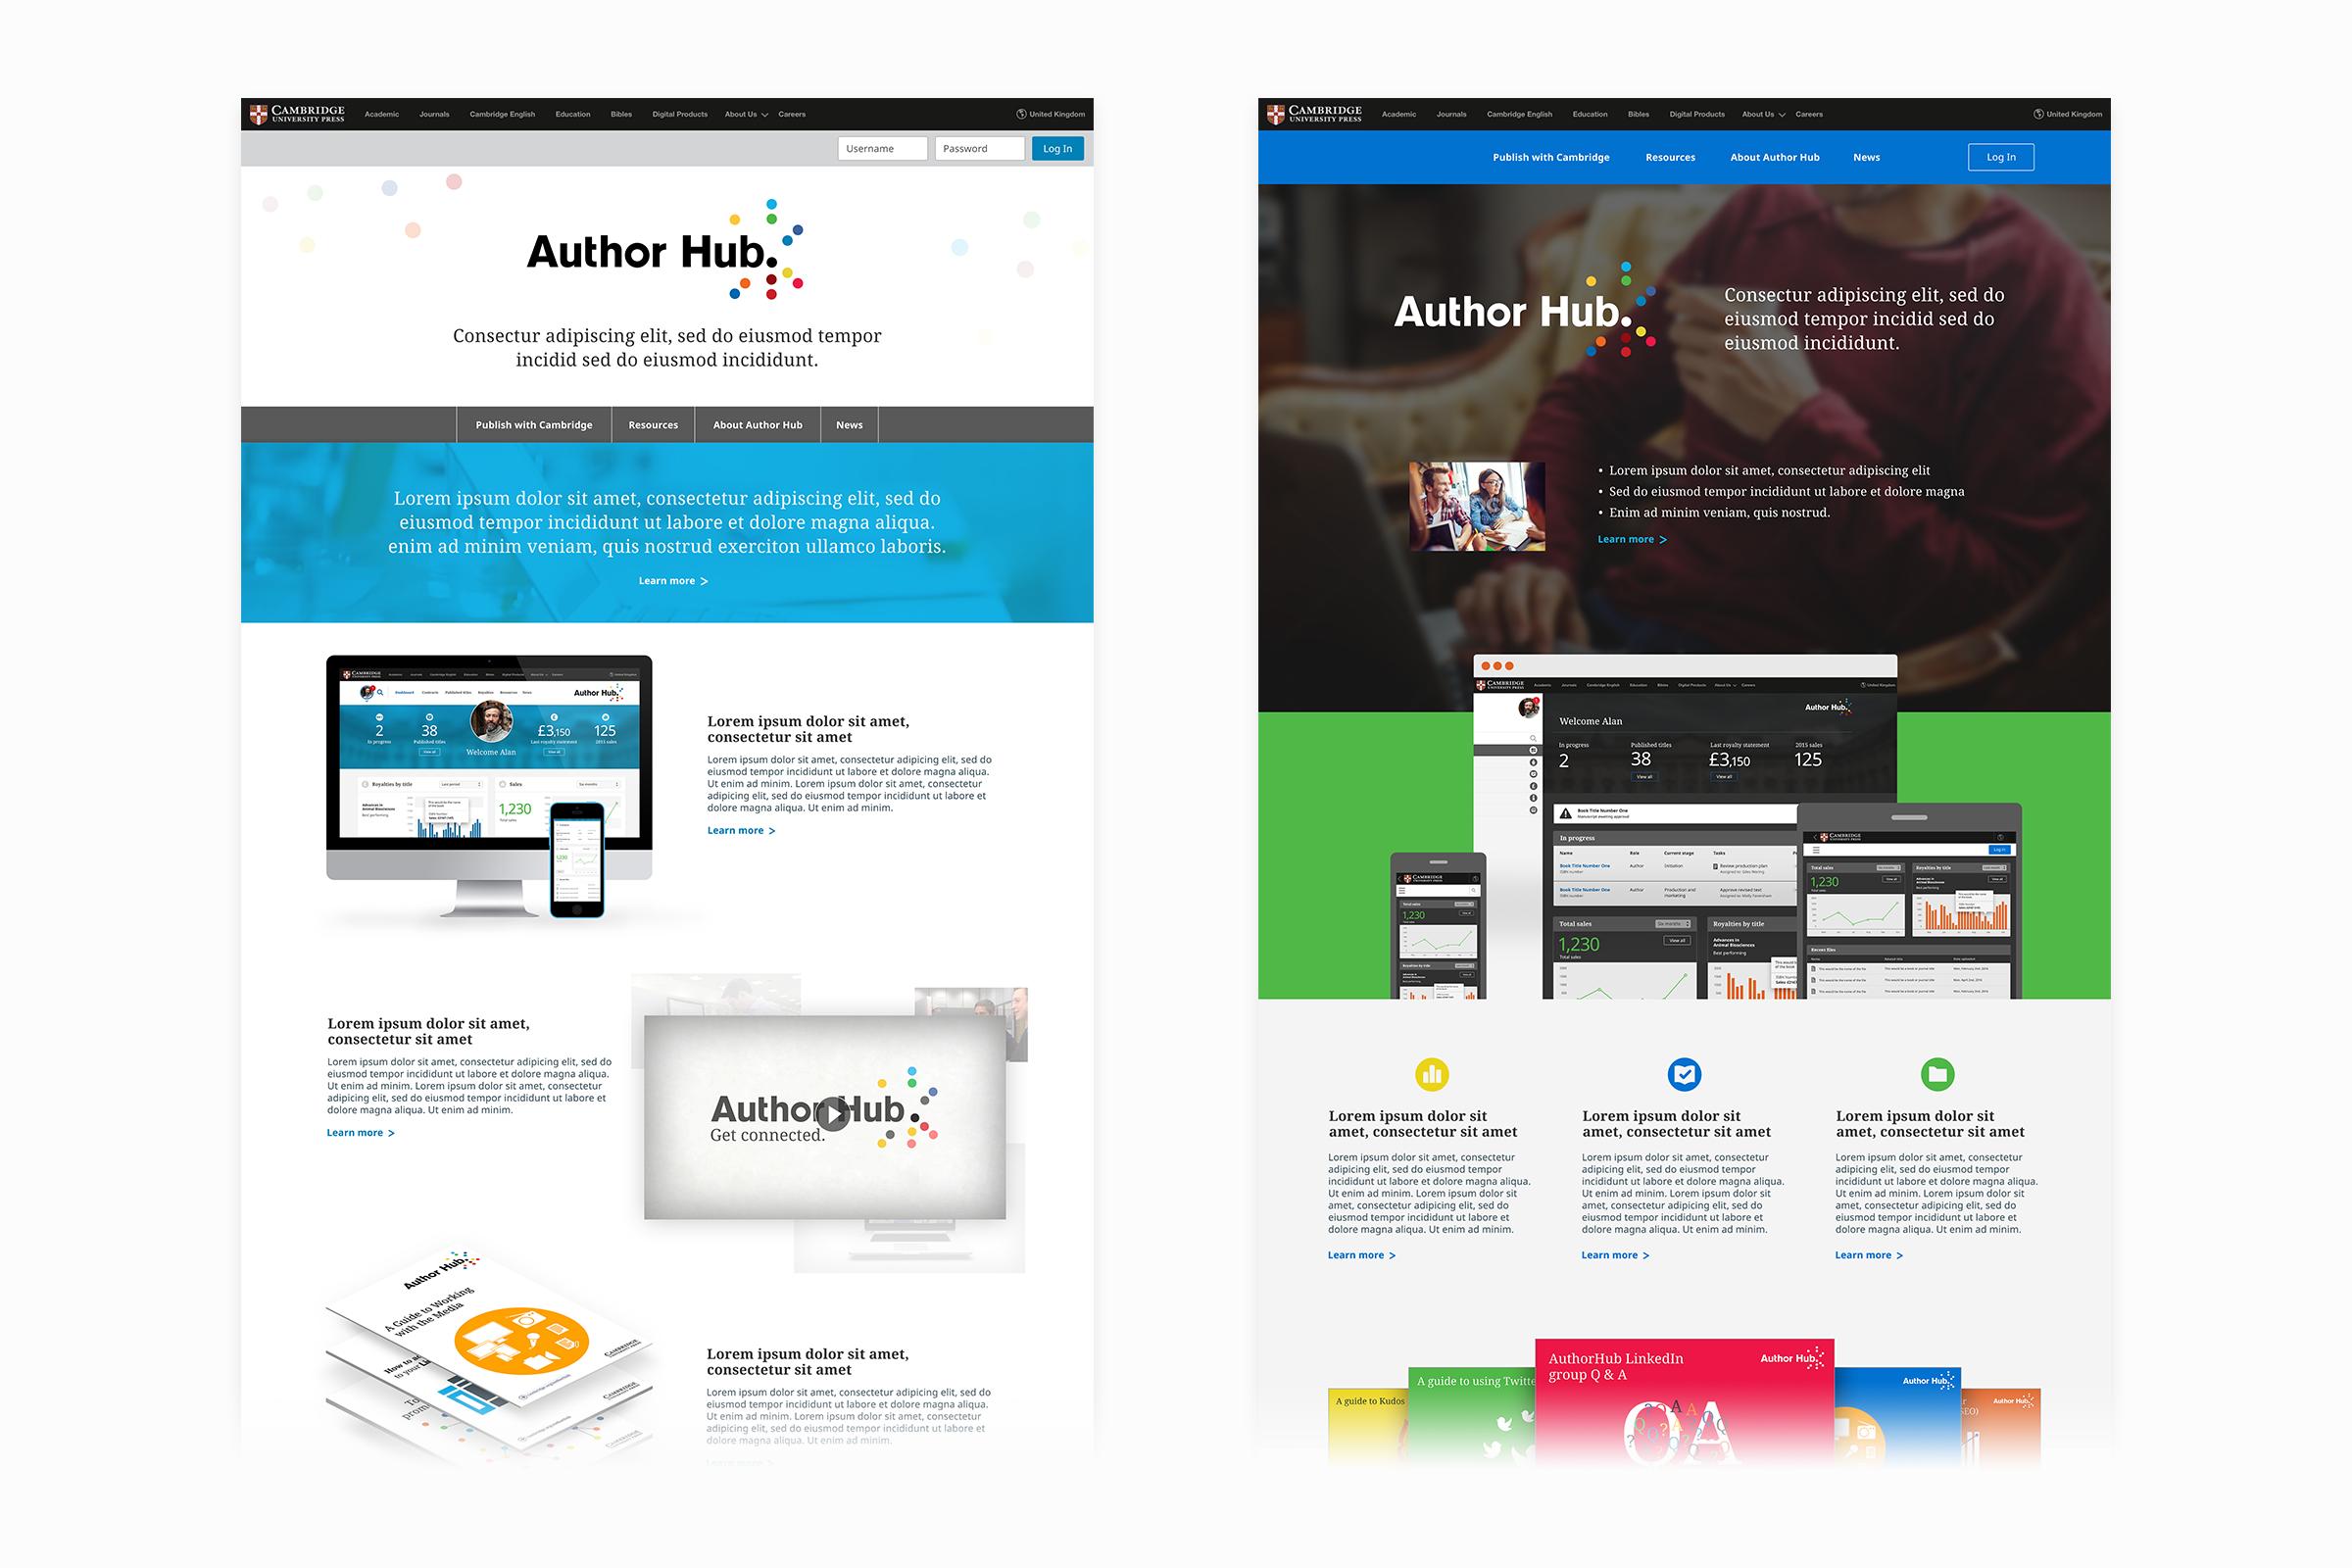 authorhub_concepts_home.png